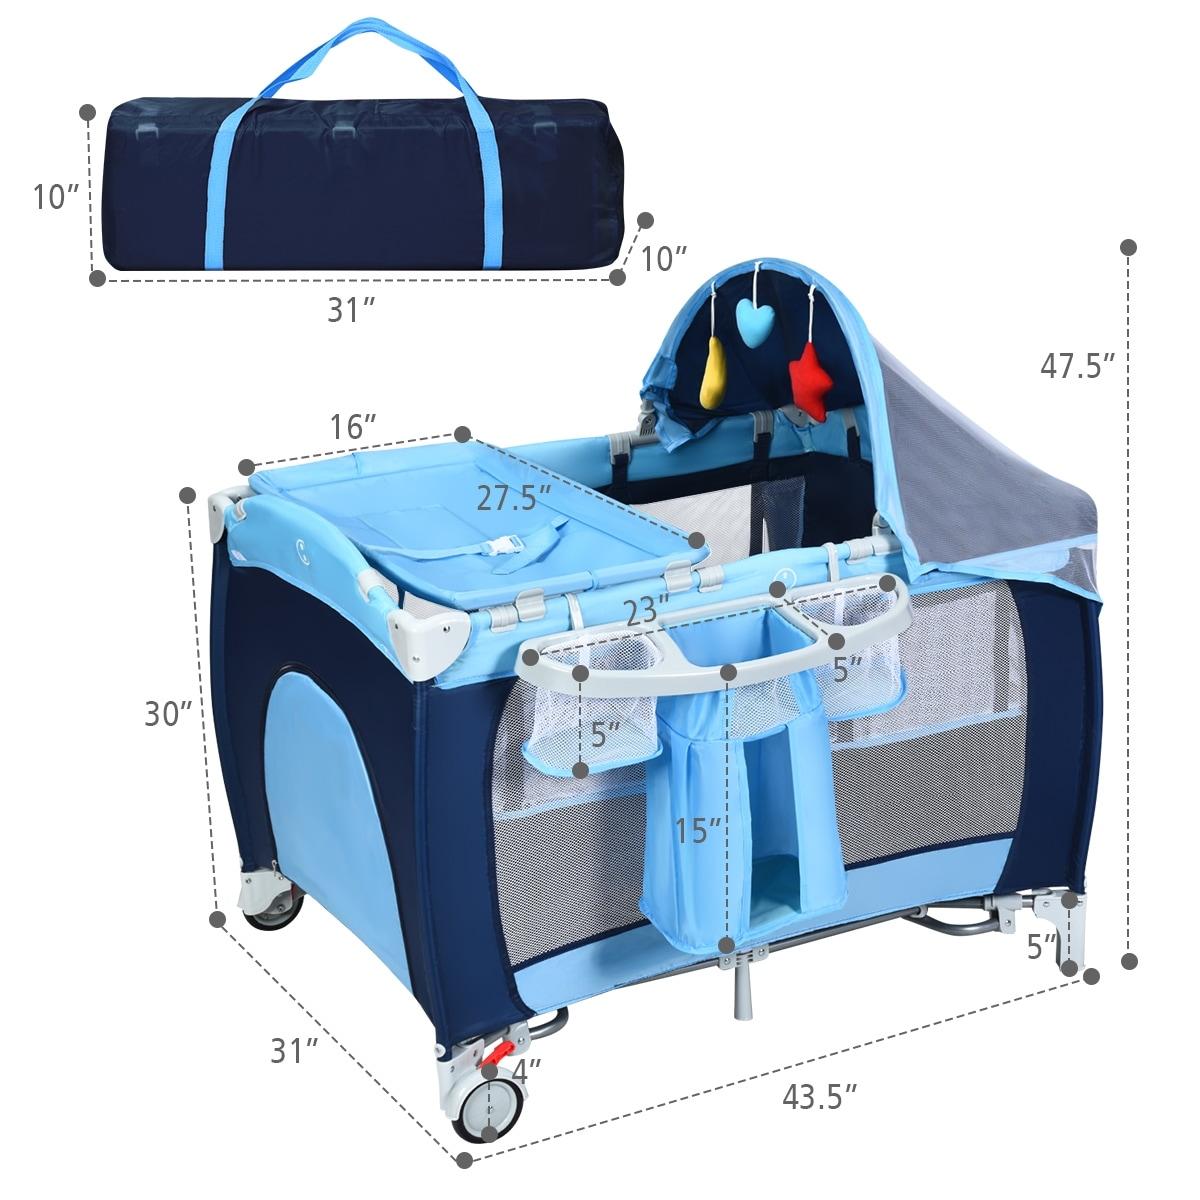 Coffee Baby Infant Crib Playpen Travel Bassinet Bed Folding Portable Wheels Bag